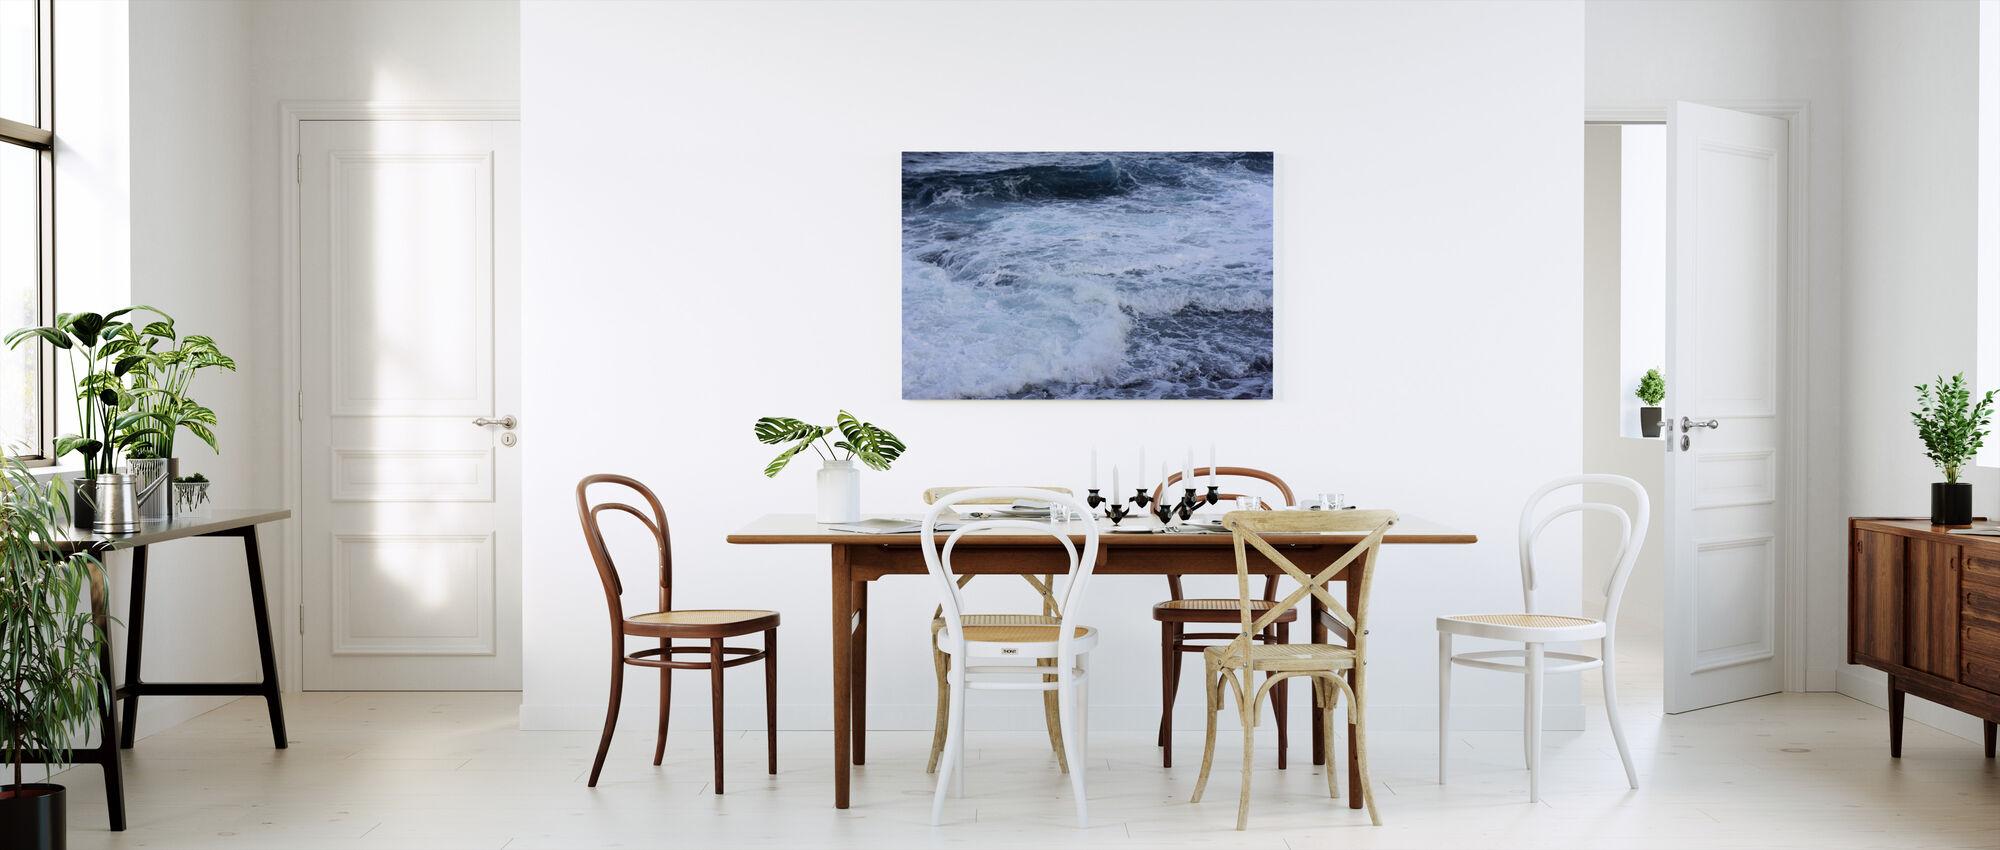 Crashing Waves - Canvas print - Kitchen